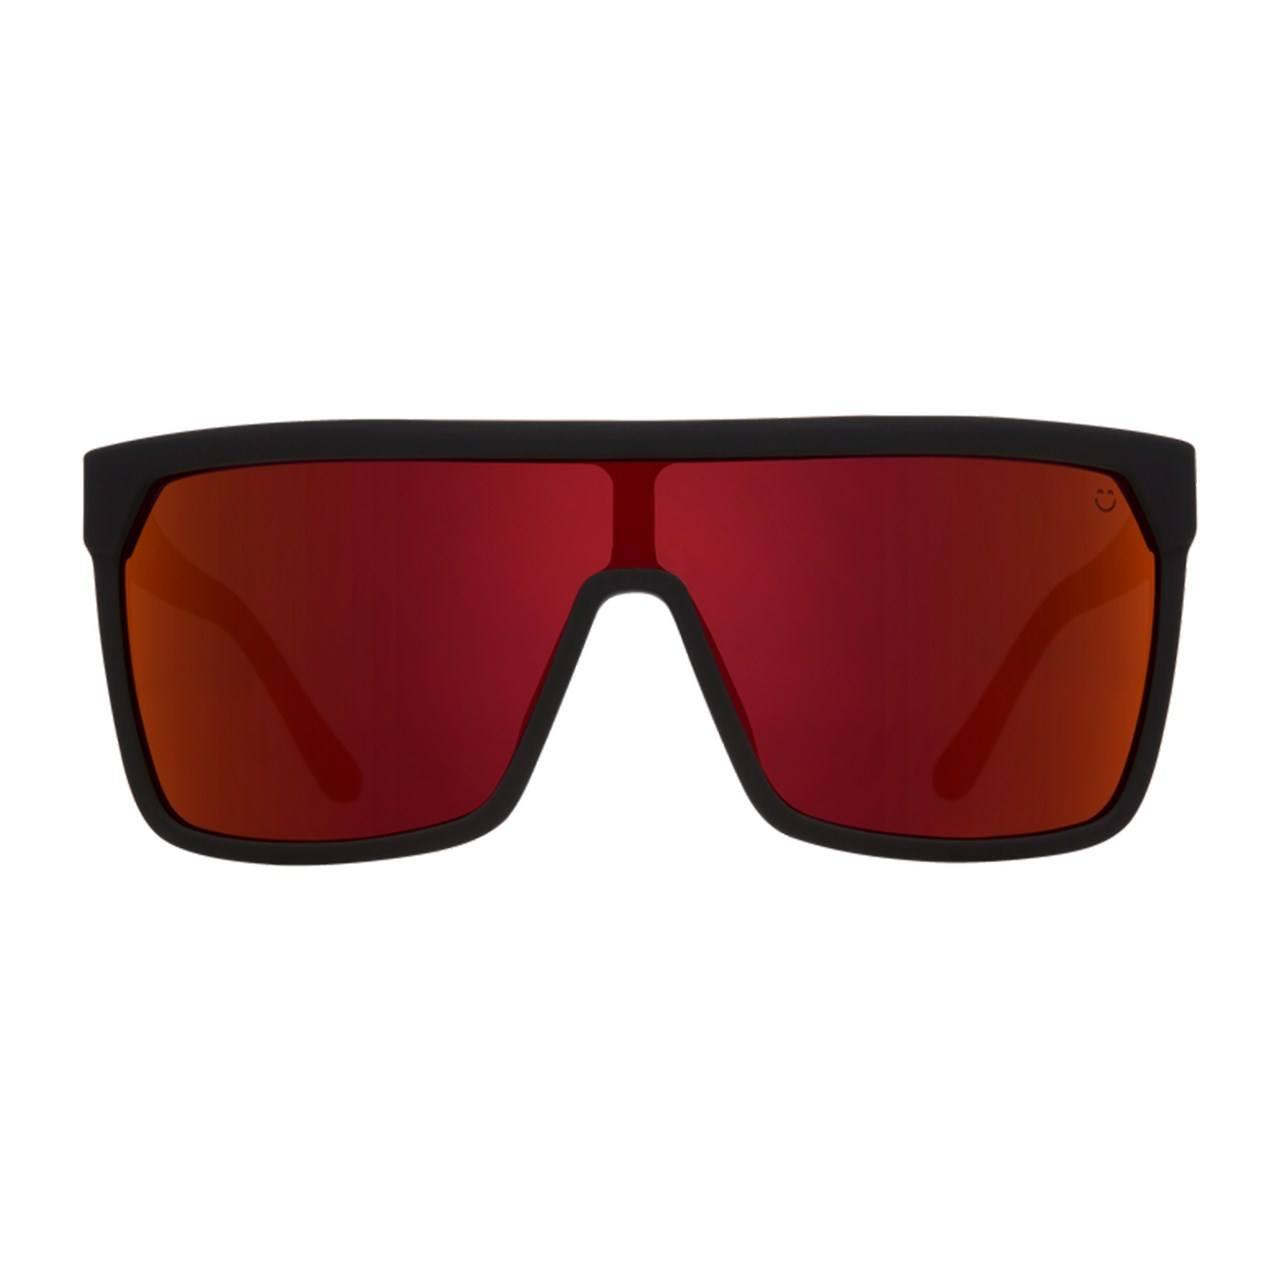 عینک آفتابی اسپای سری Flynn مدل Soft Matte Black Red Fade Happy Gray Green Red Flash -  - 1